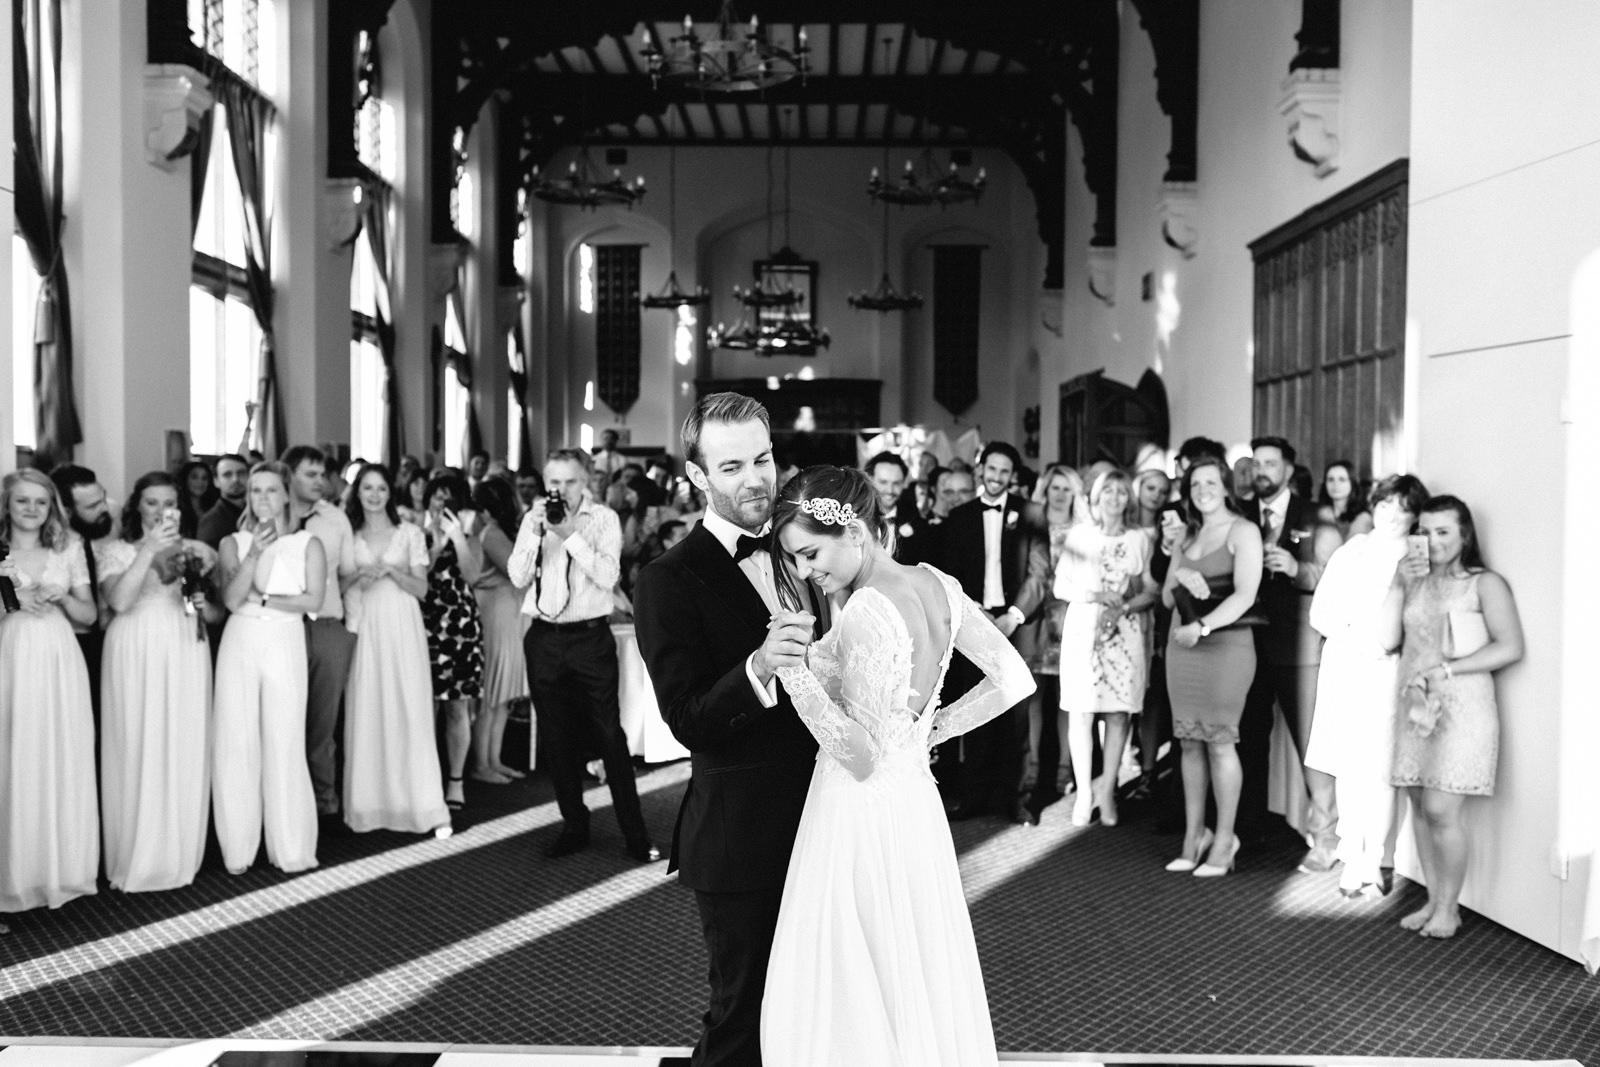 Stanbrooke Abbey Wedding Photographer-322732.jpg